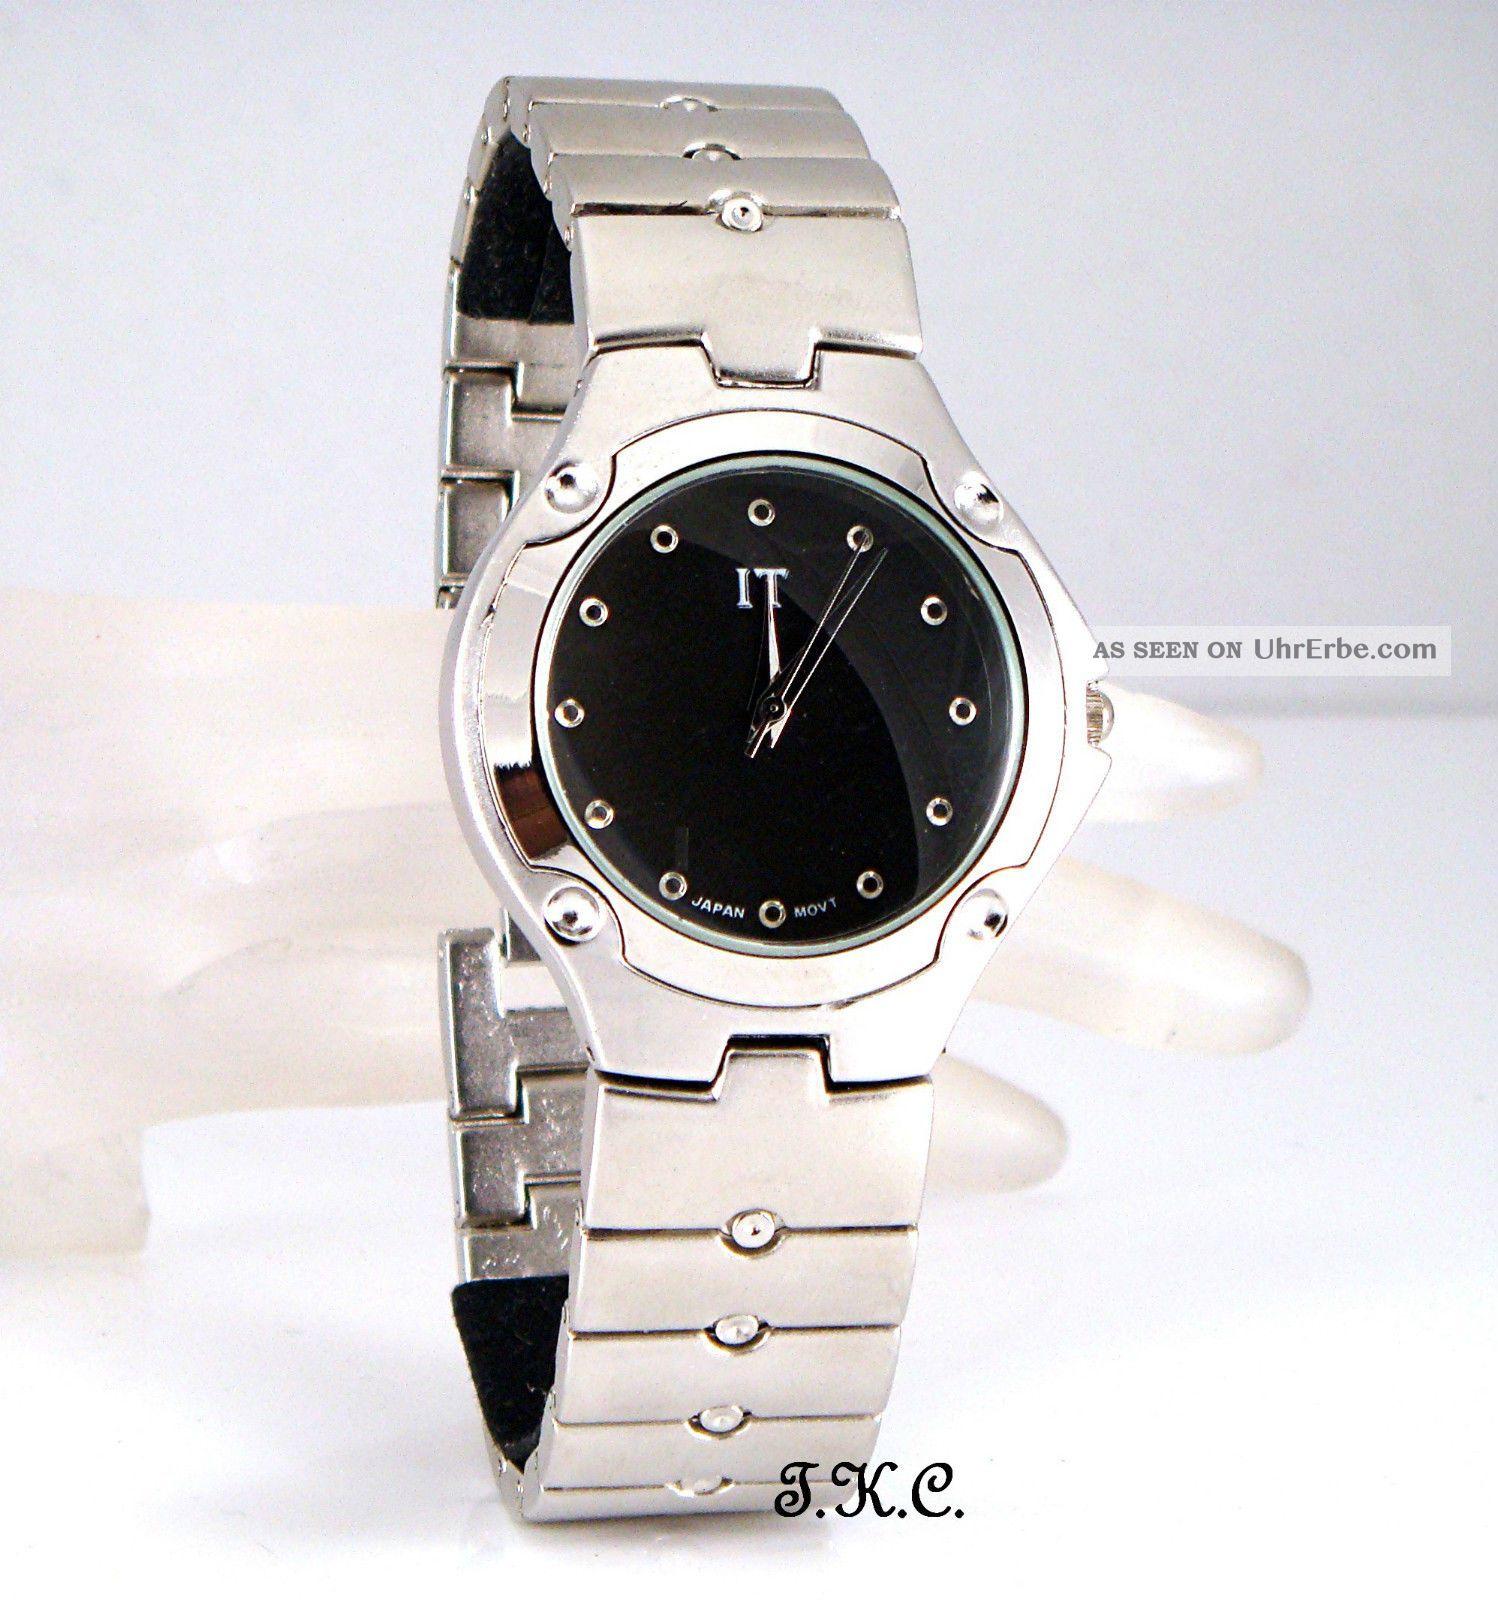 Herren Armbanduhr Gents Retro Classic Matt Silber Schwartz Farbe,  Japan Movt Armbanduhren Bild